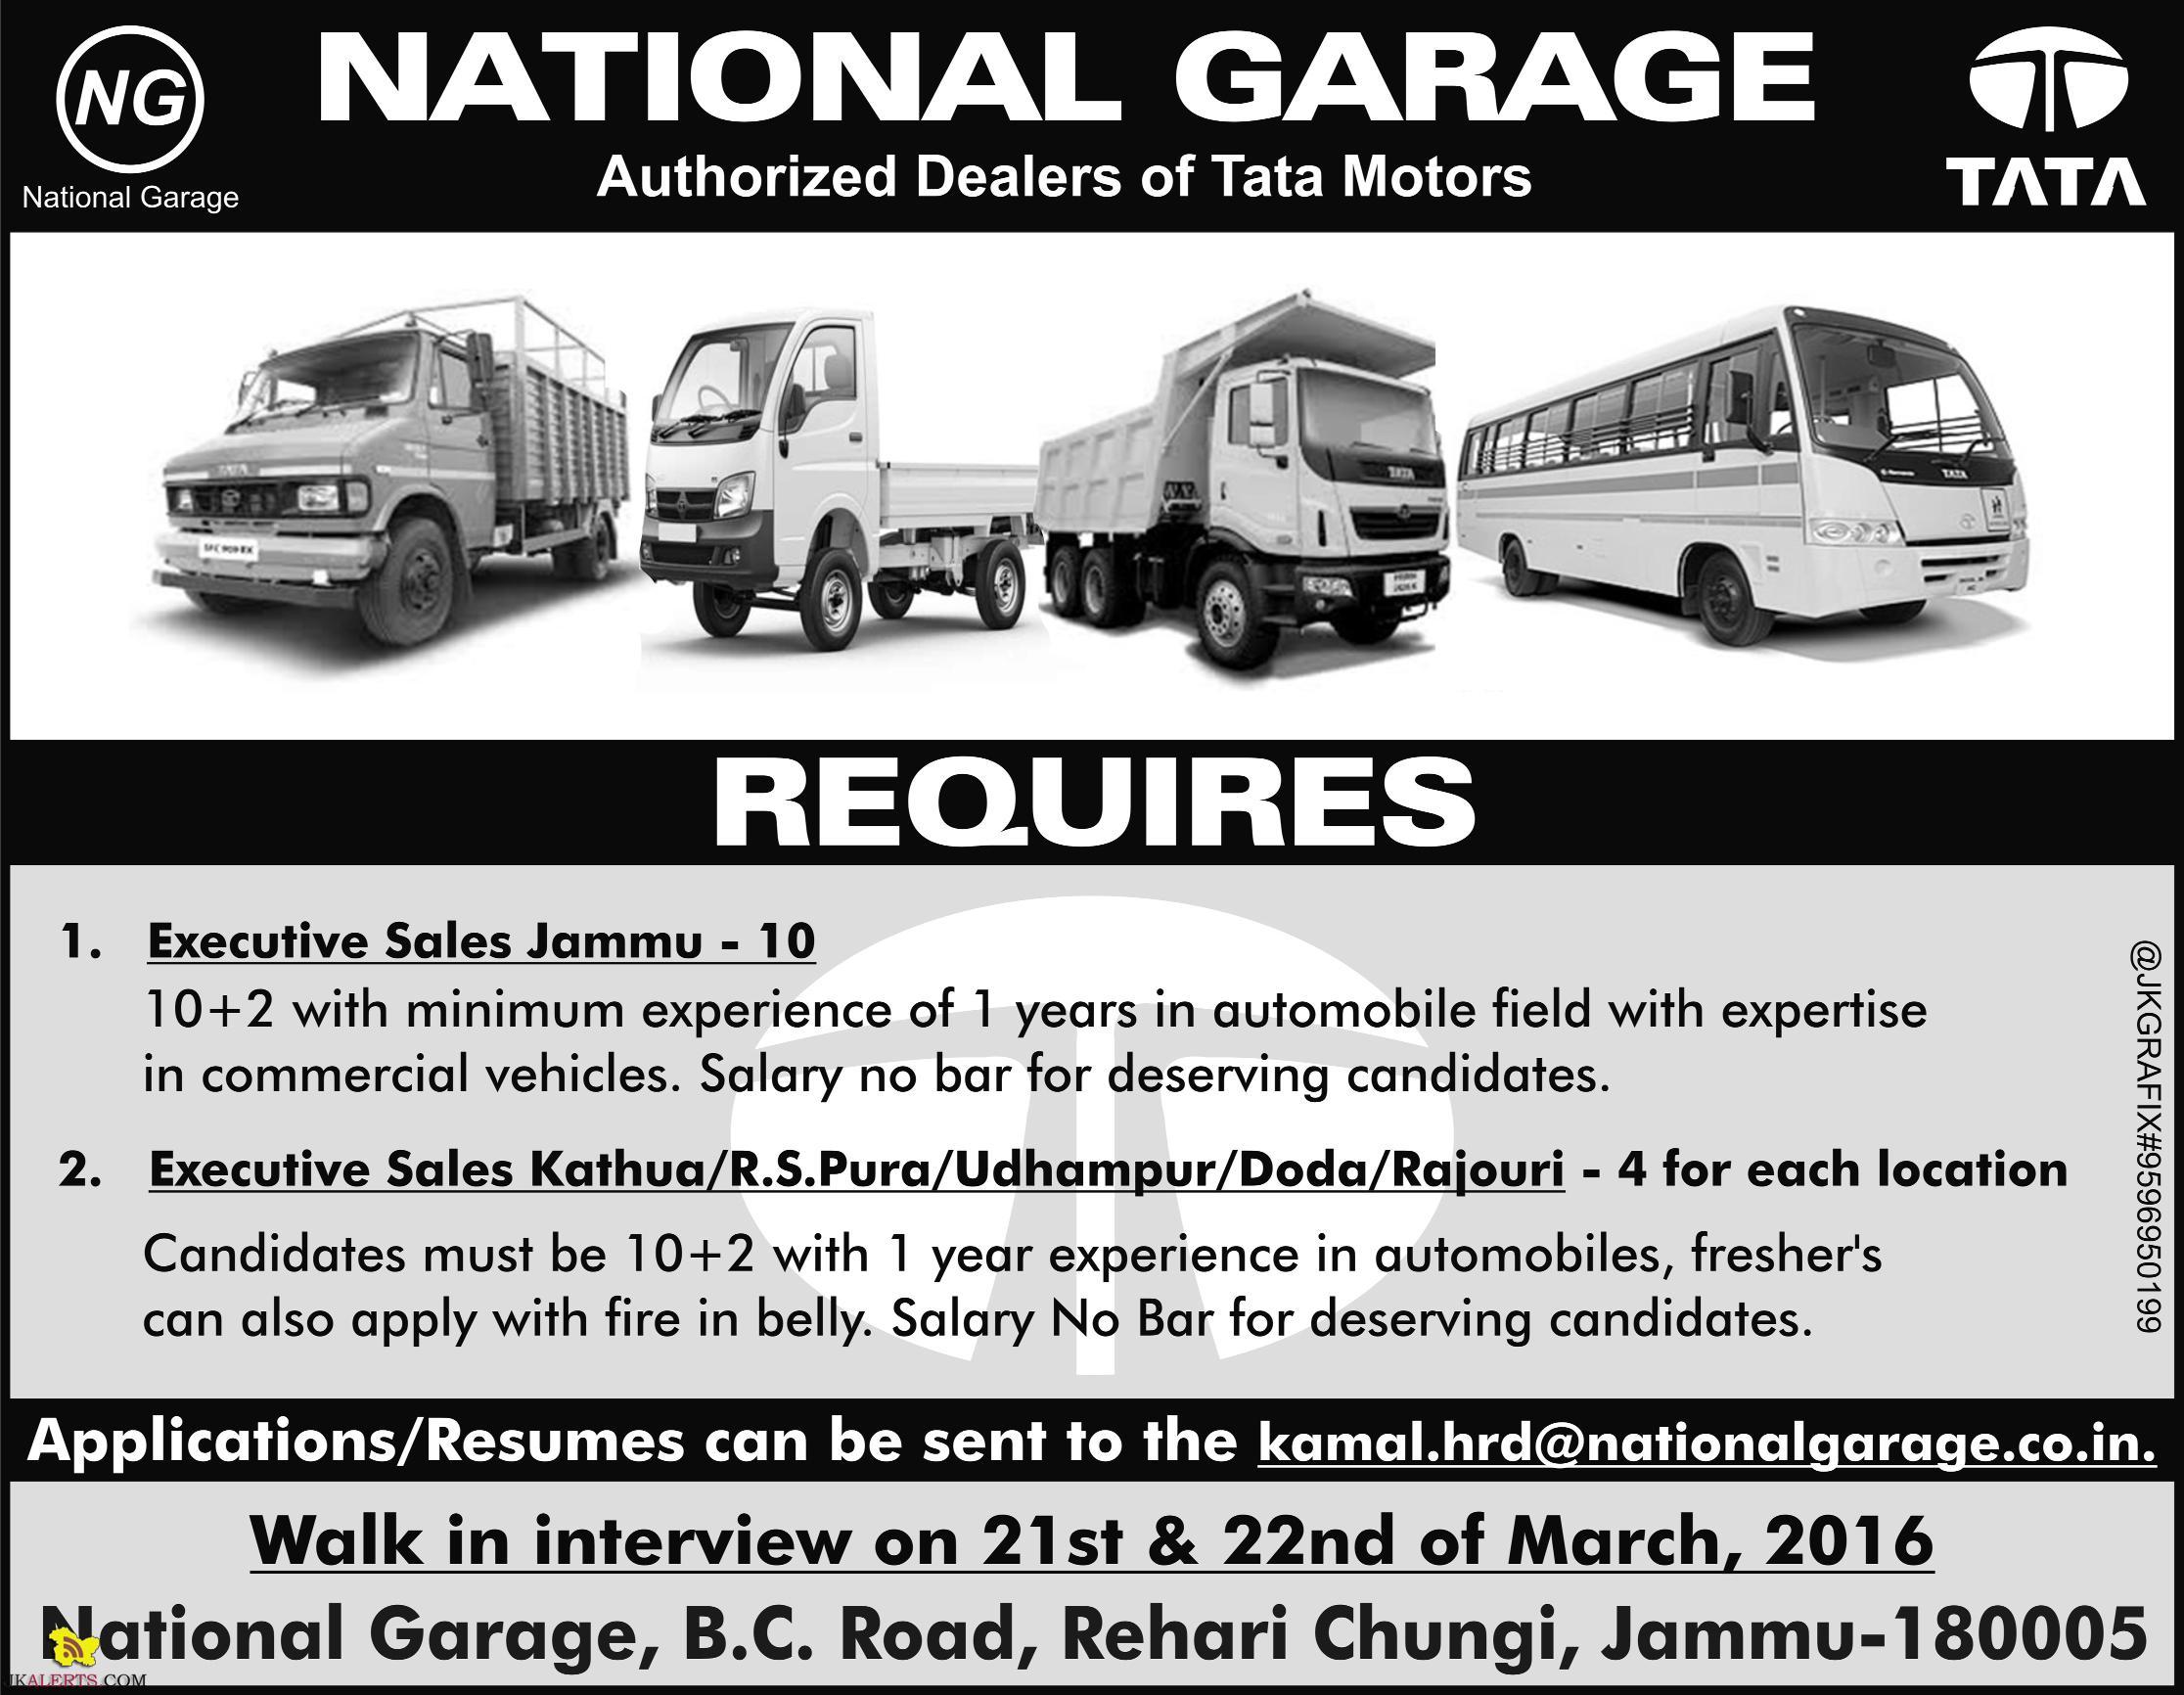 Jobs in National Garage Kathua, R.S.Pura, Udhampur, Doda , Rajouri